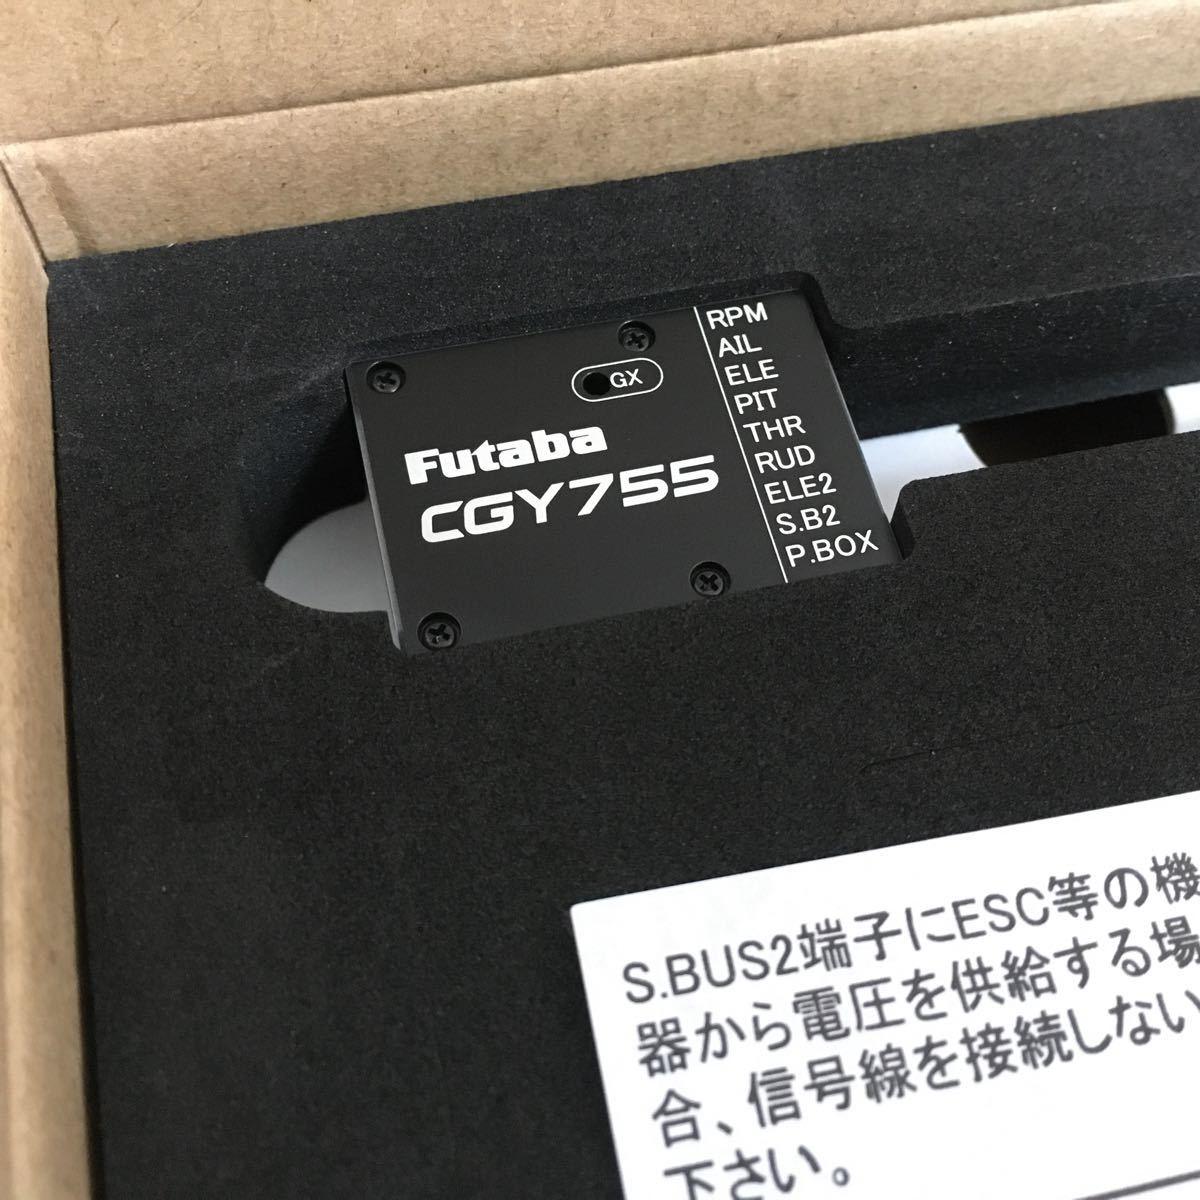 FUTABA CGY755 ラジコンヘリ用 3軸ジャイロ ガバナー内蔵 フタバ